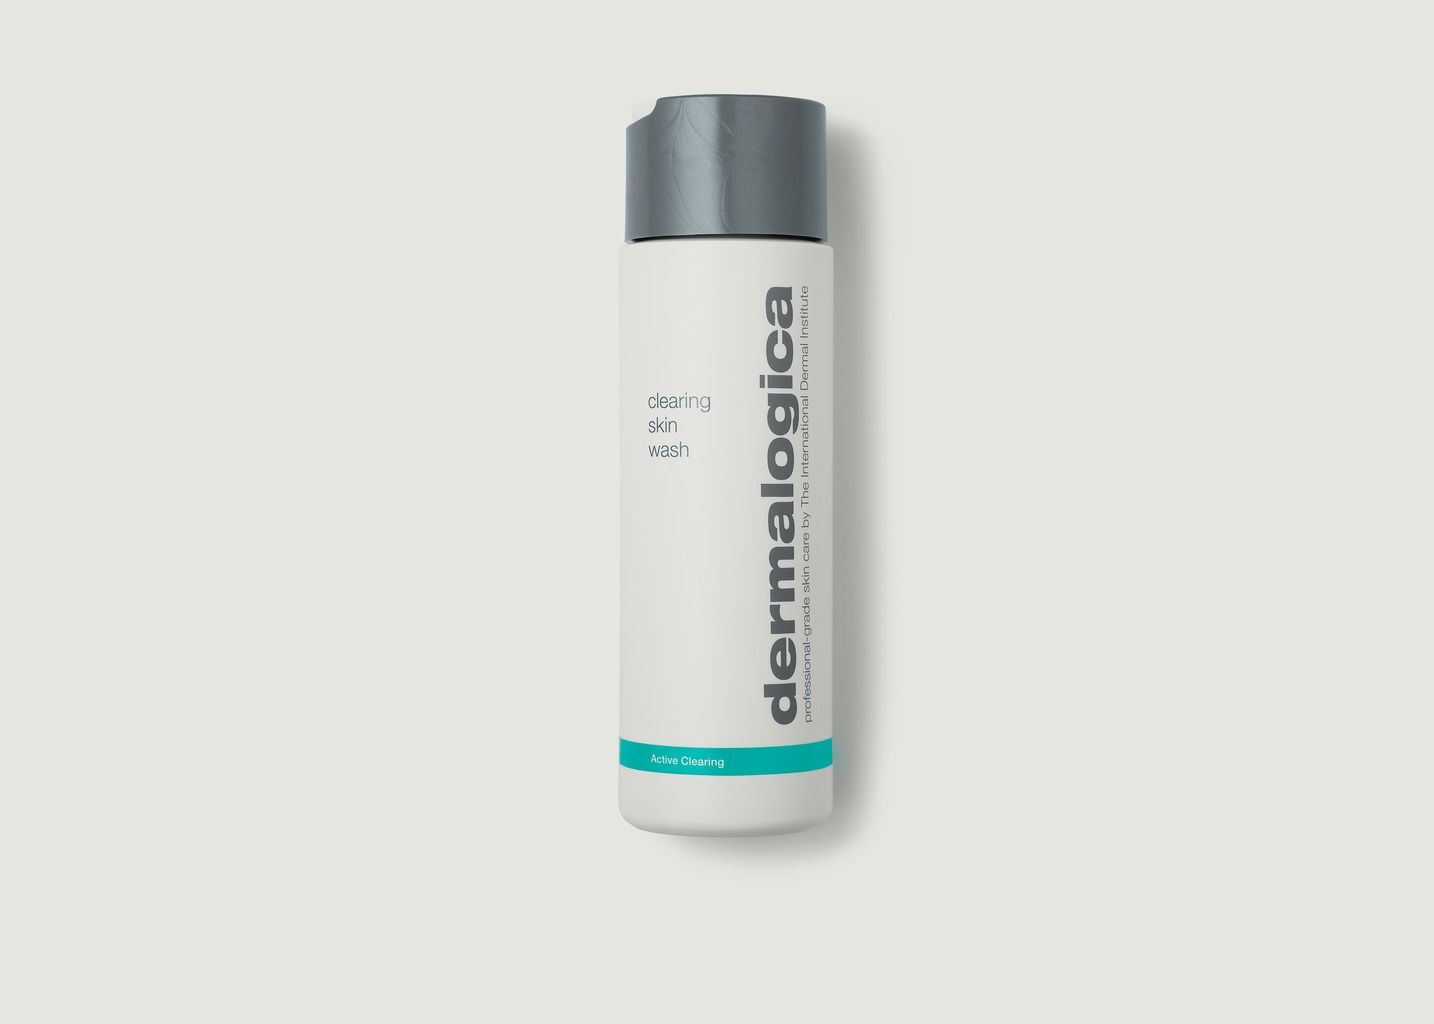 Clearing skin wash 250ml - Dermalogica